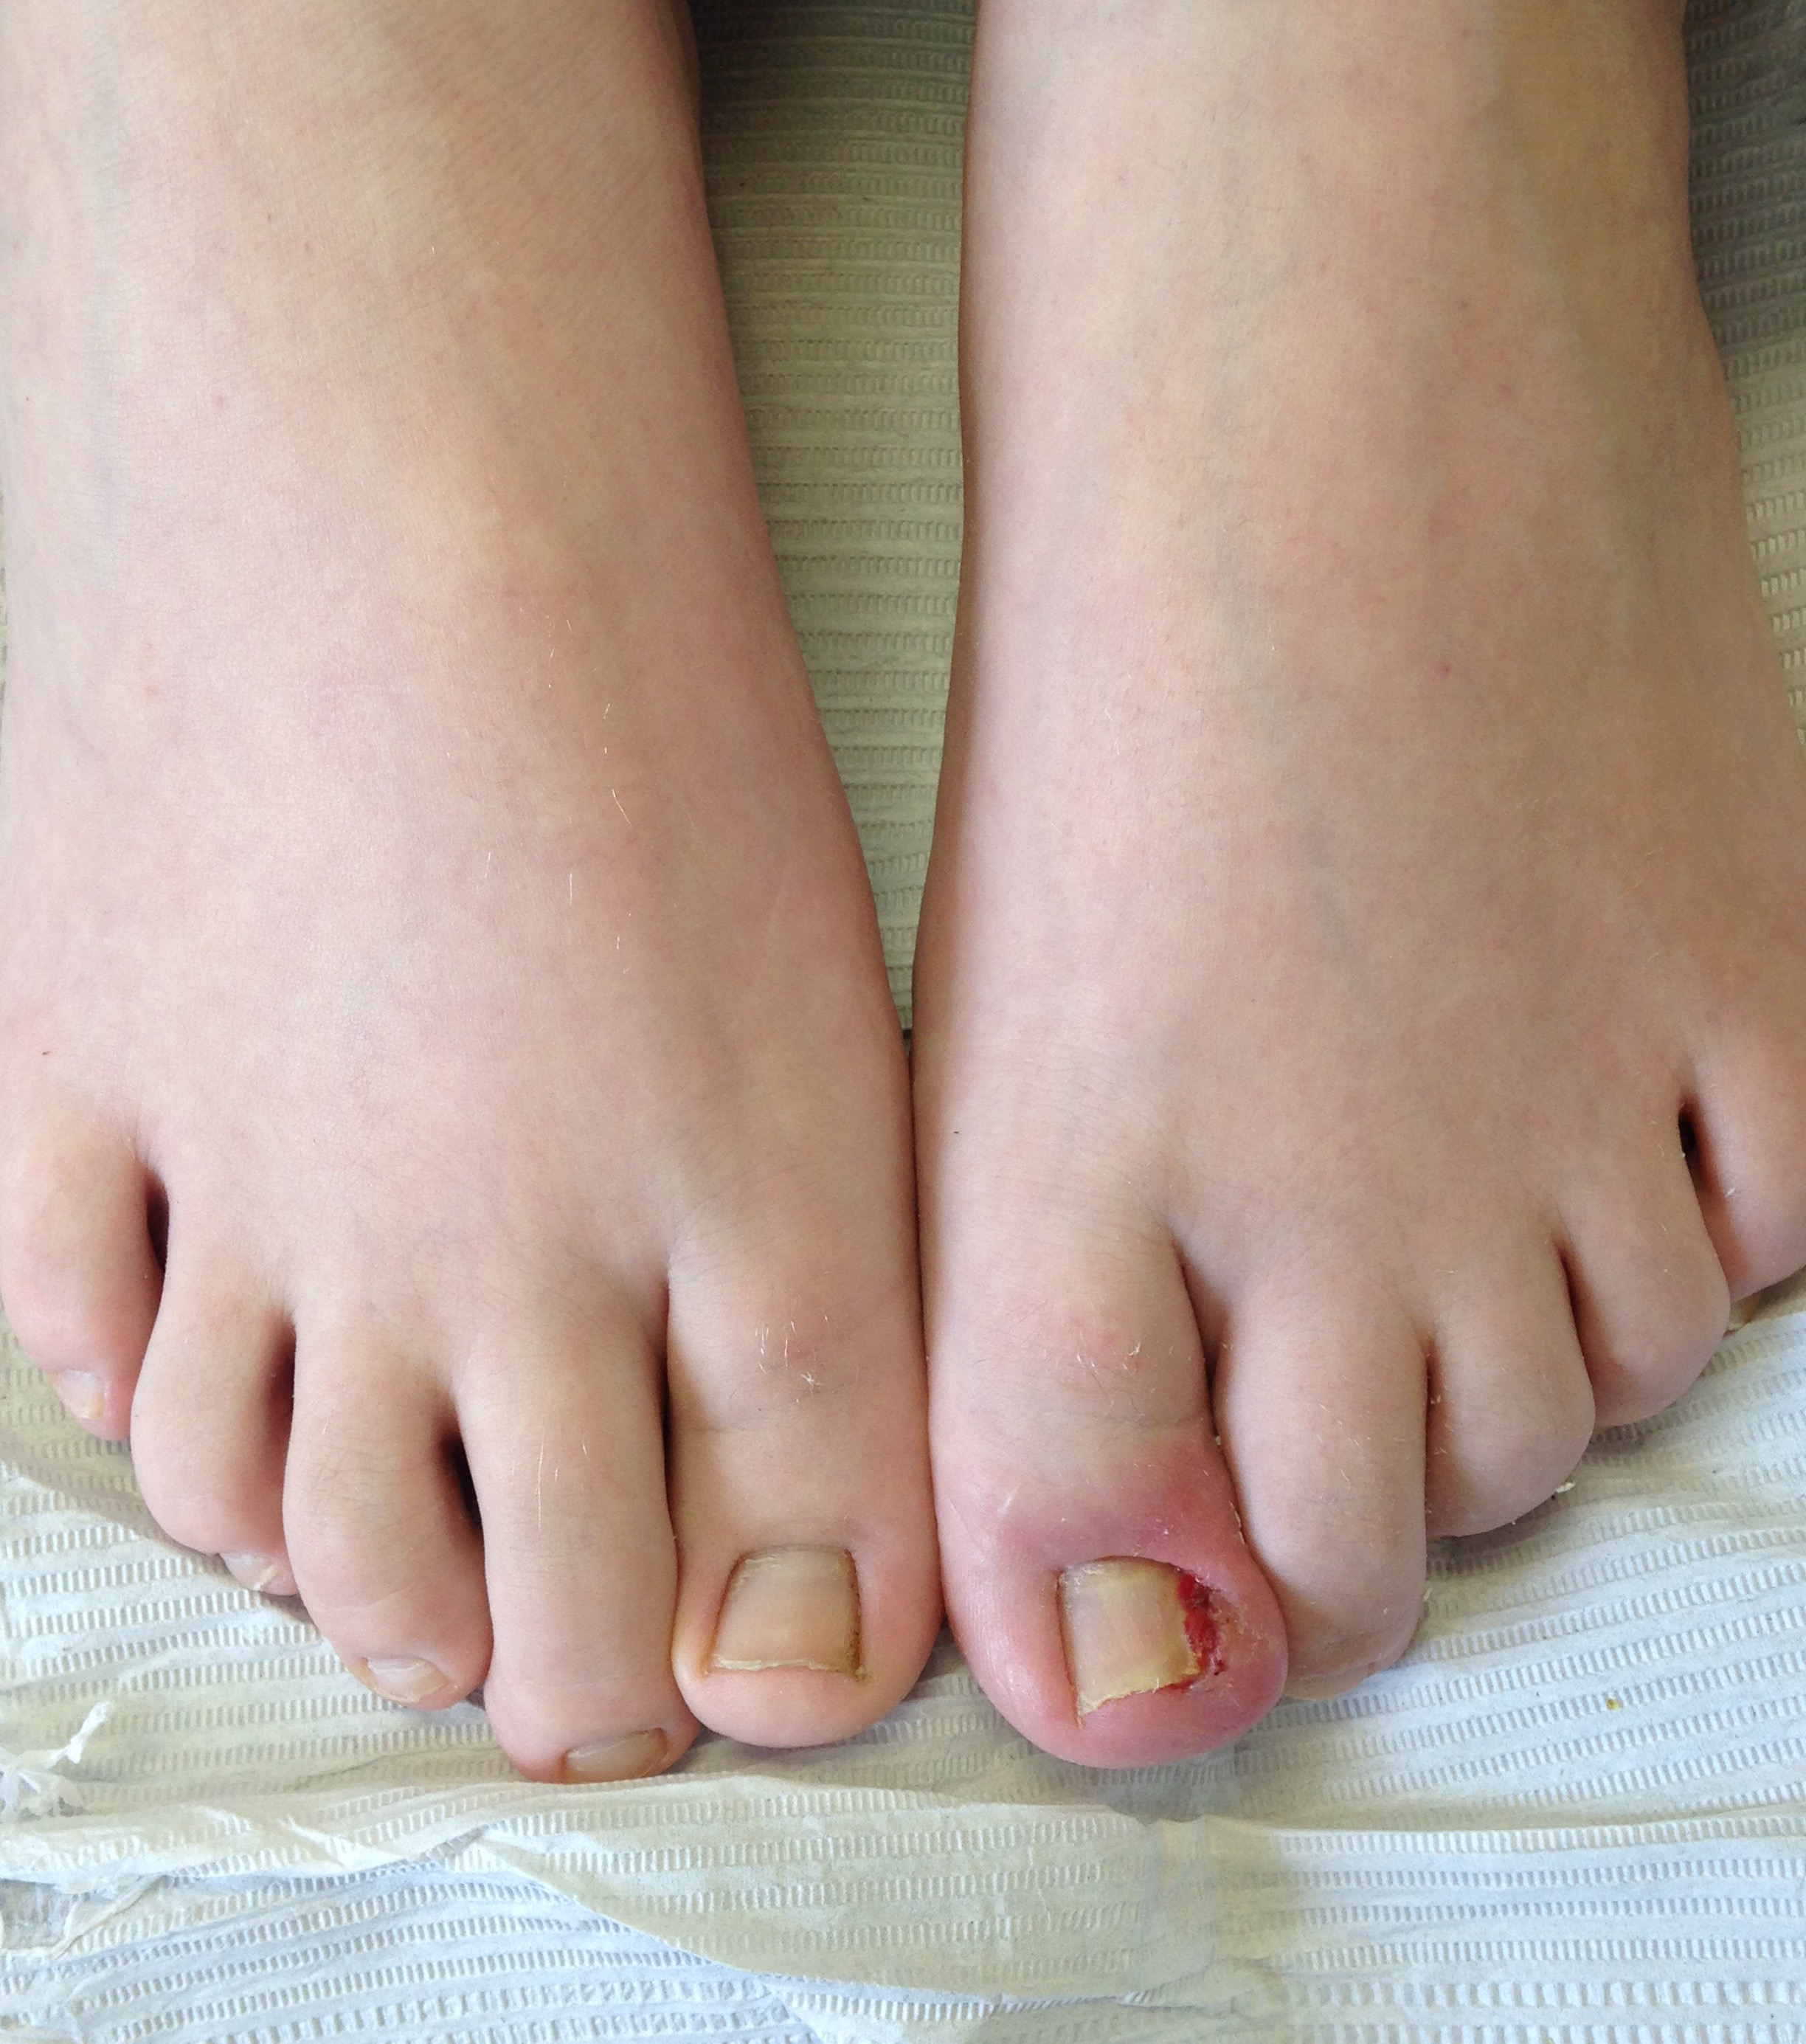 Ingrown after surgery toe toenail numb still Post ingrown